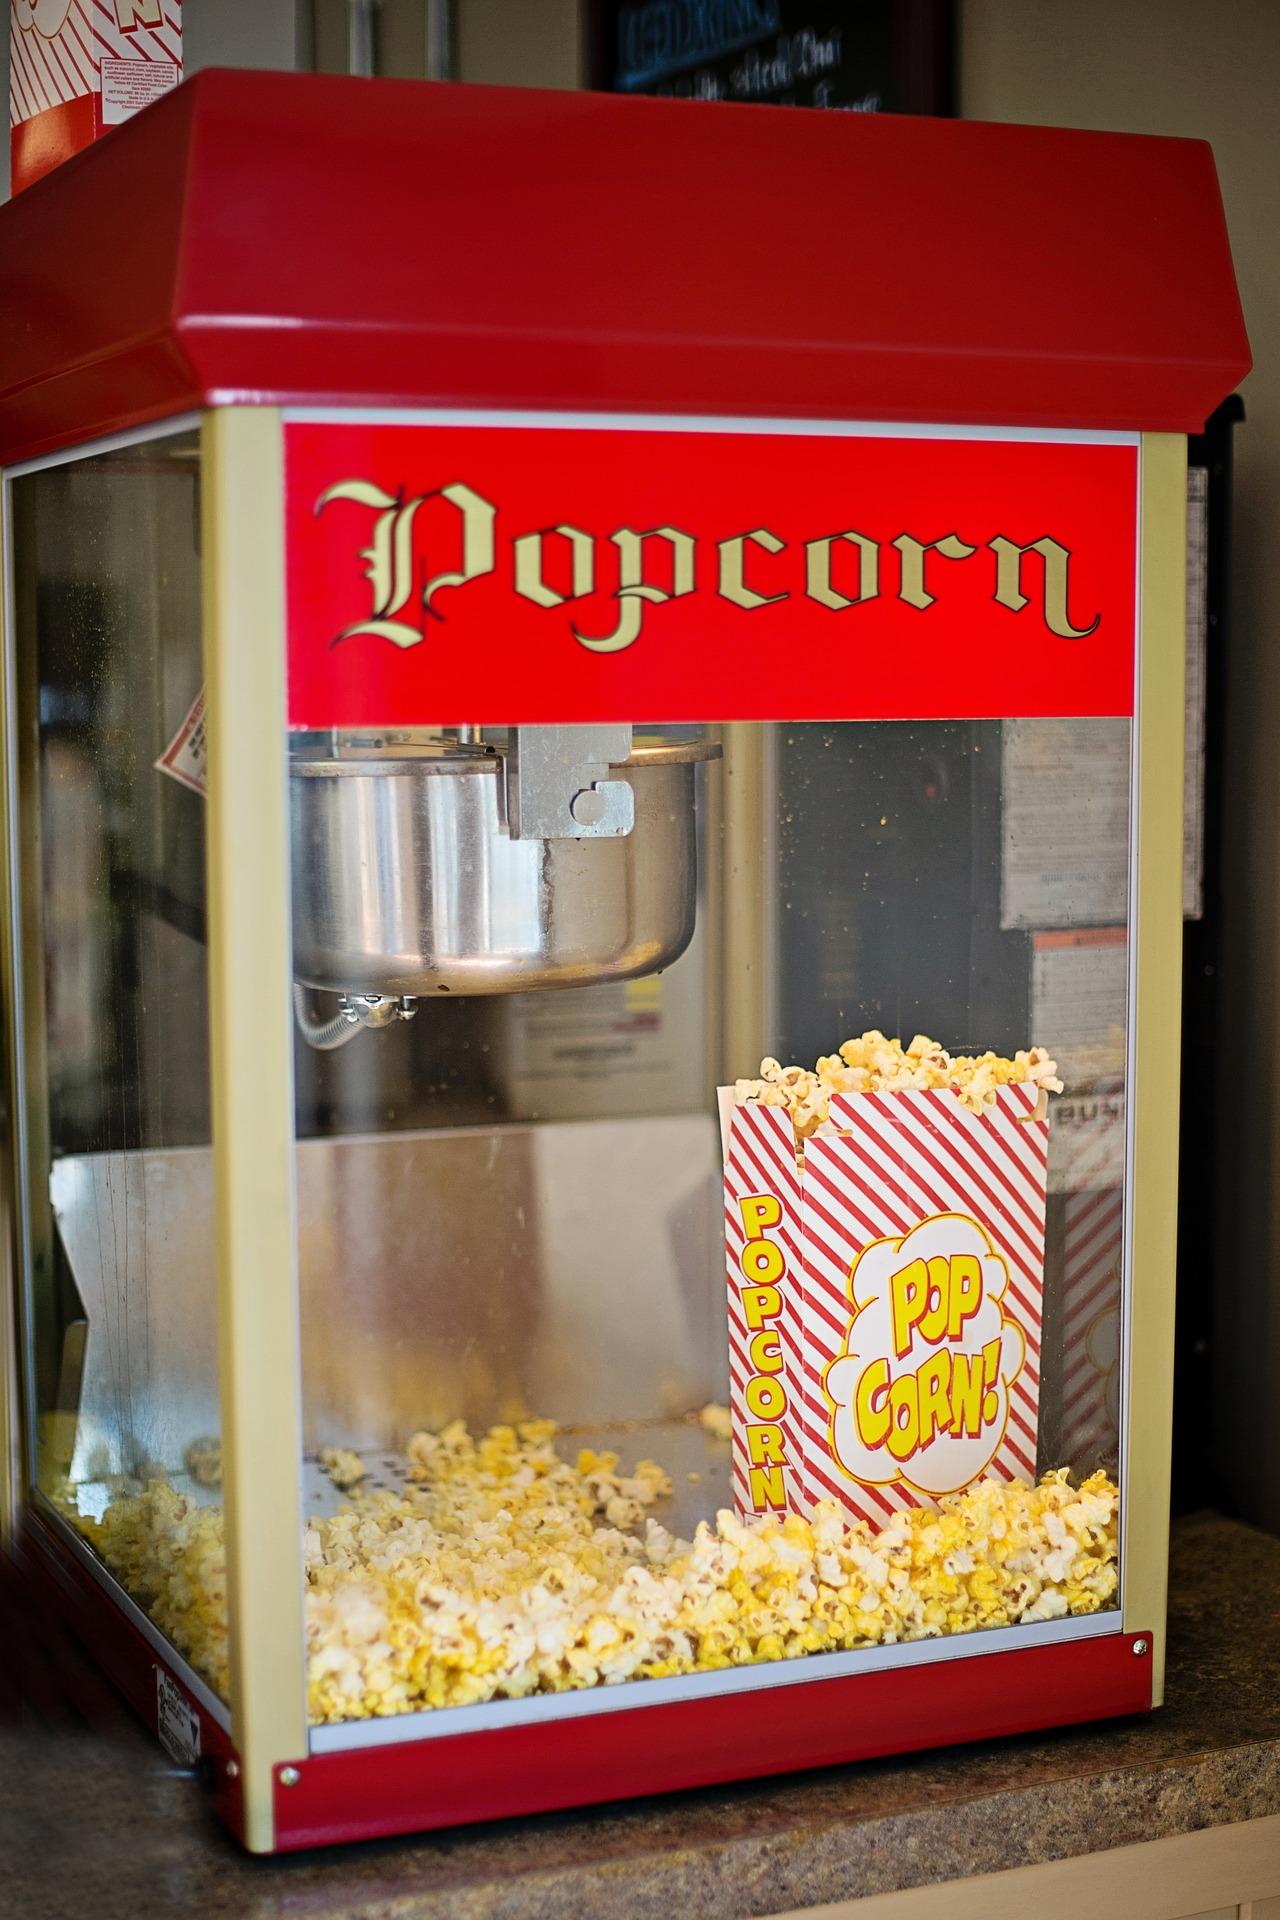 popcorn-machine-825636_1920.jpg